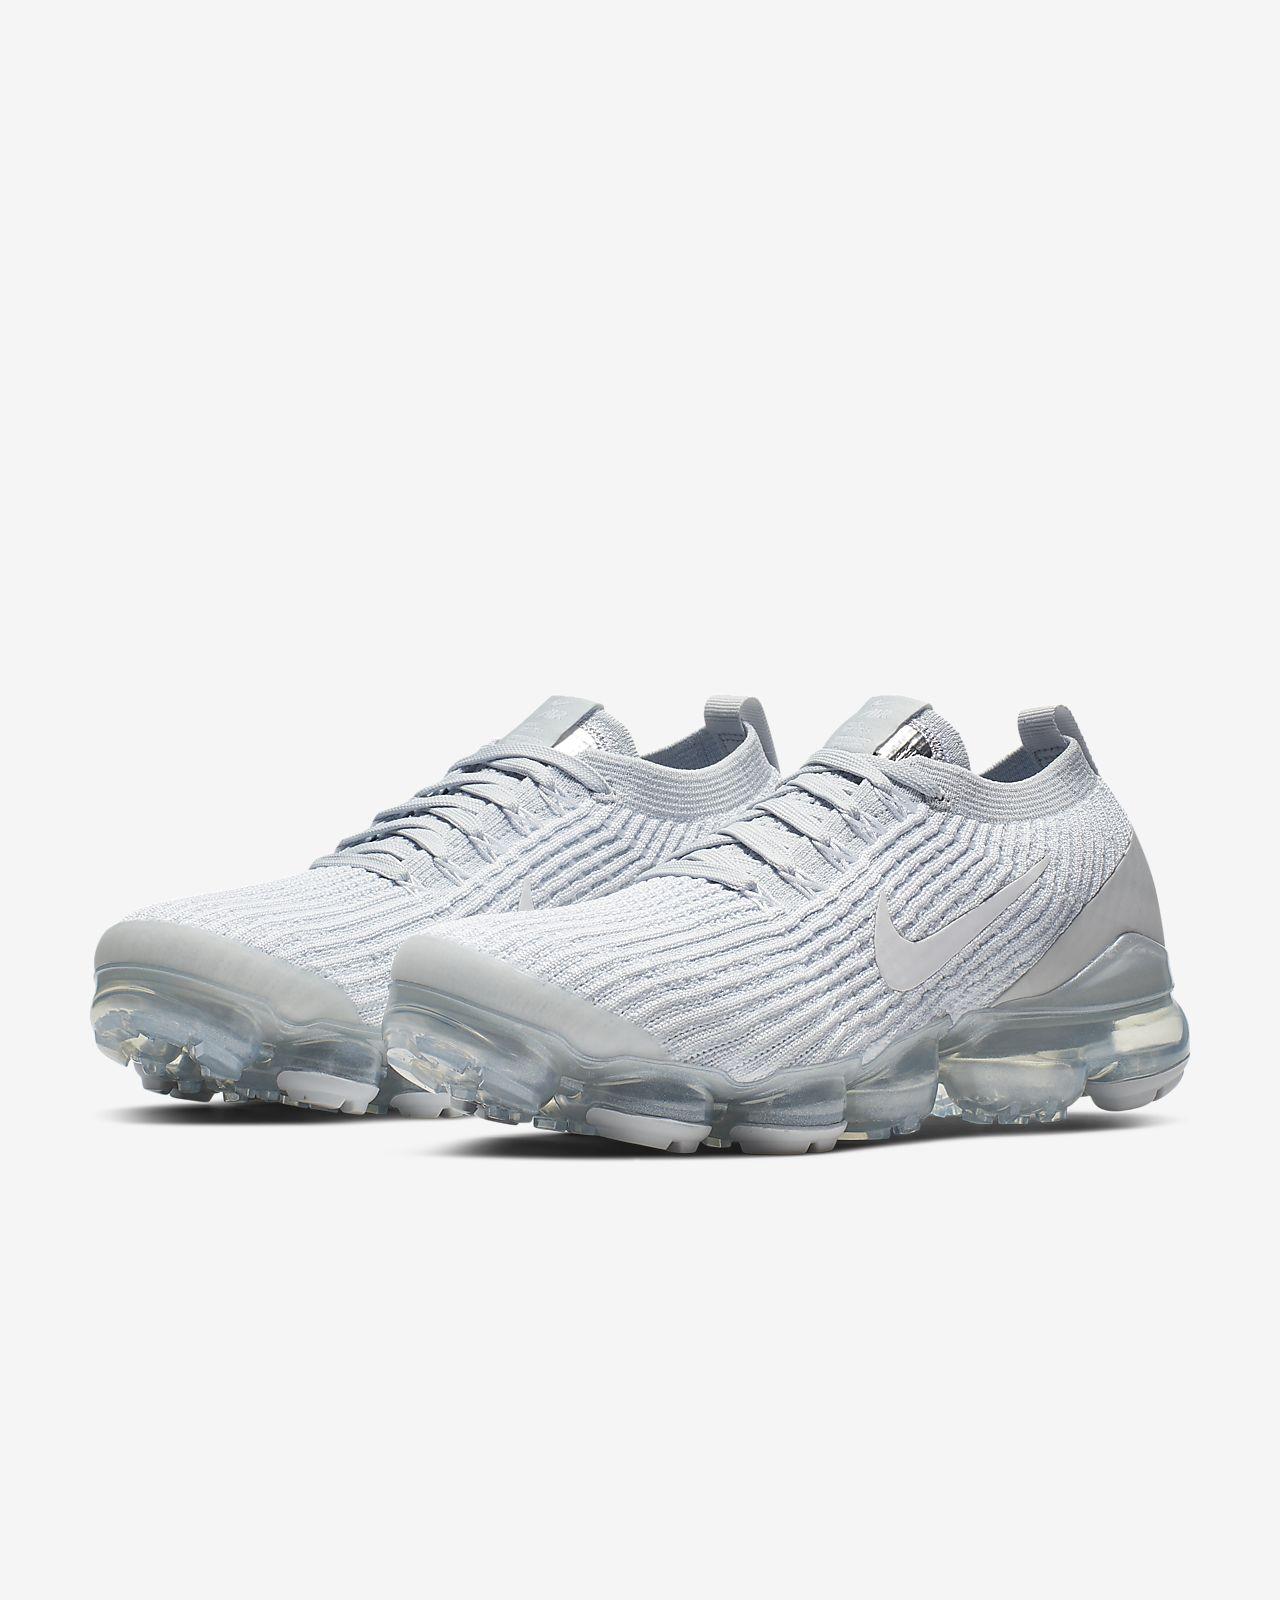 nike air vapormax flyknit 3 white/platinum women's shoe